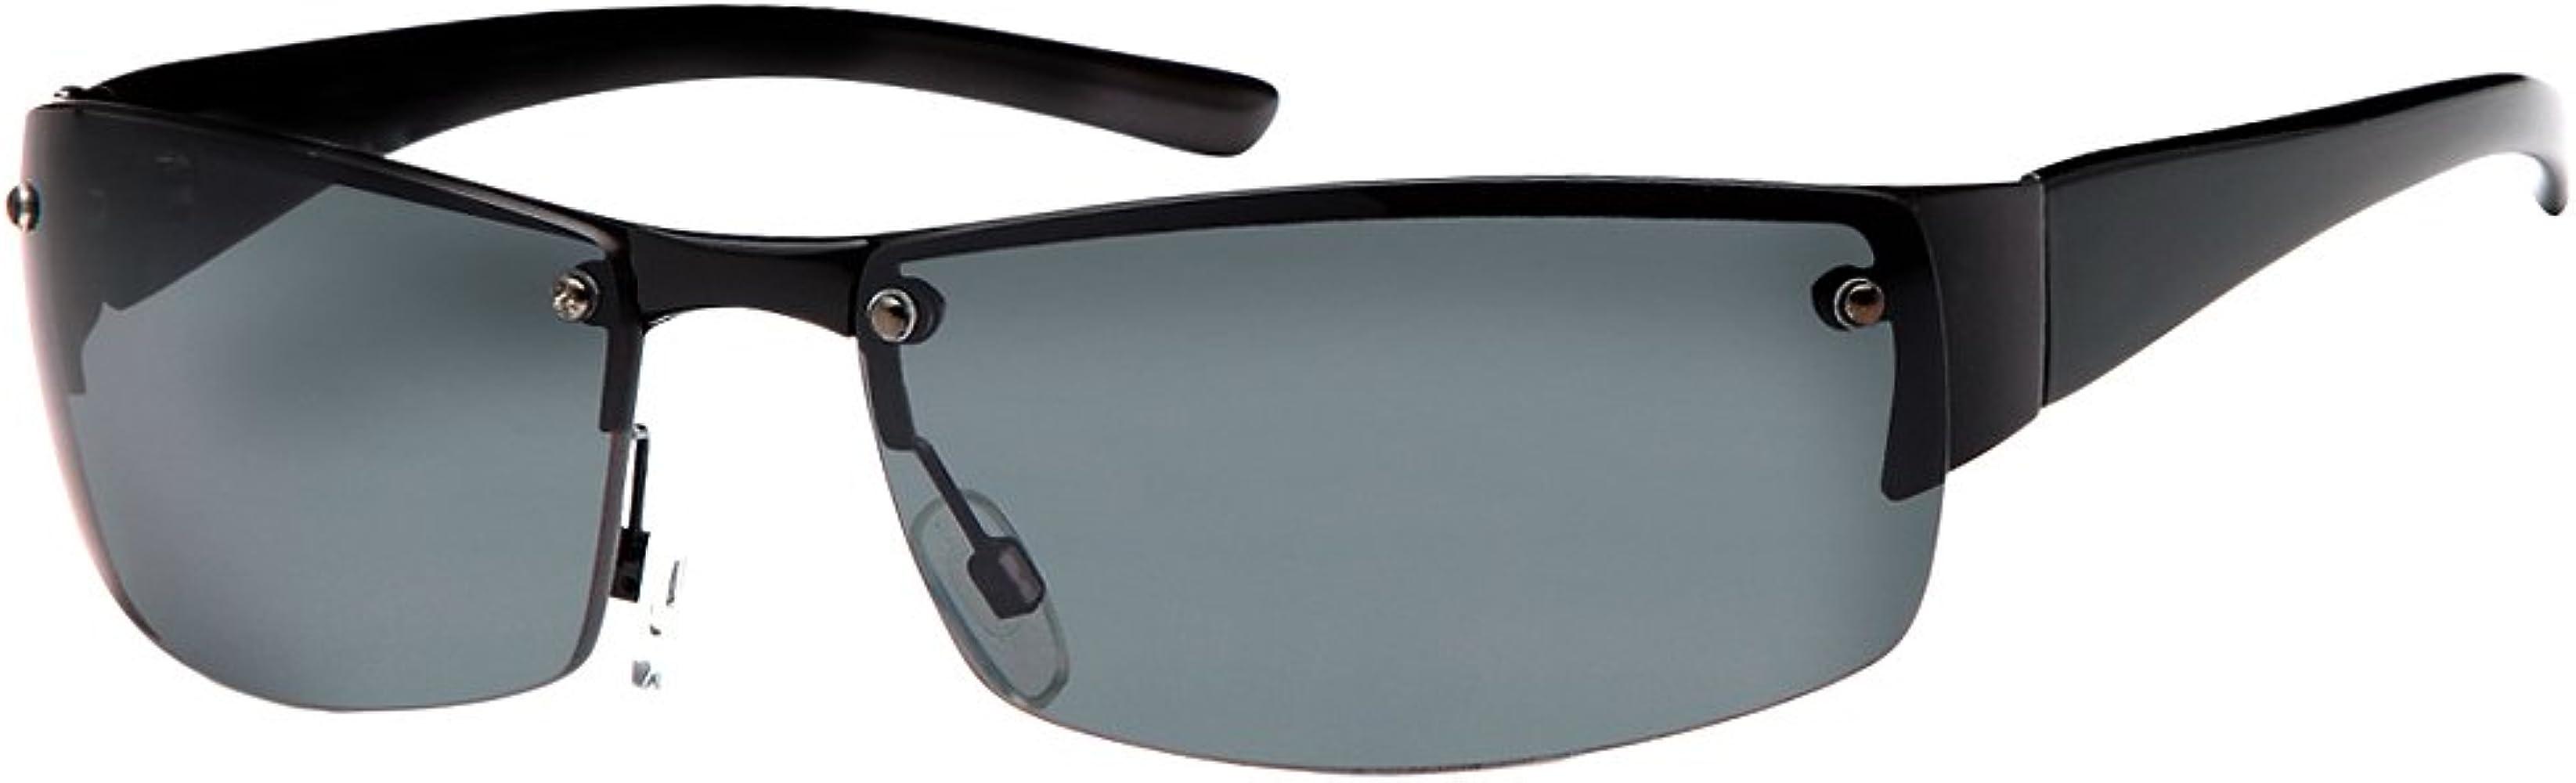 Tedd Haze - Gafas de sol - para hombre morado morado talla ...